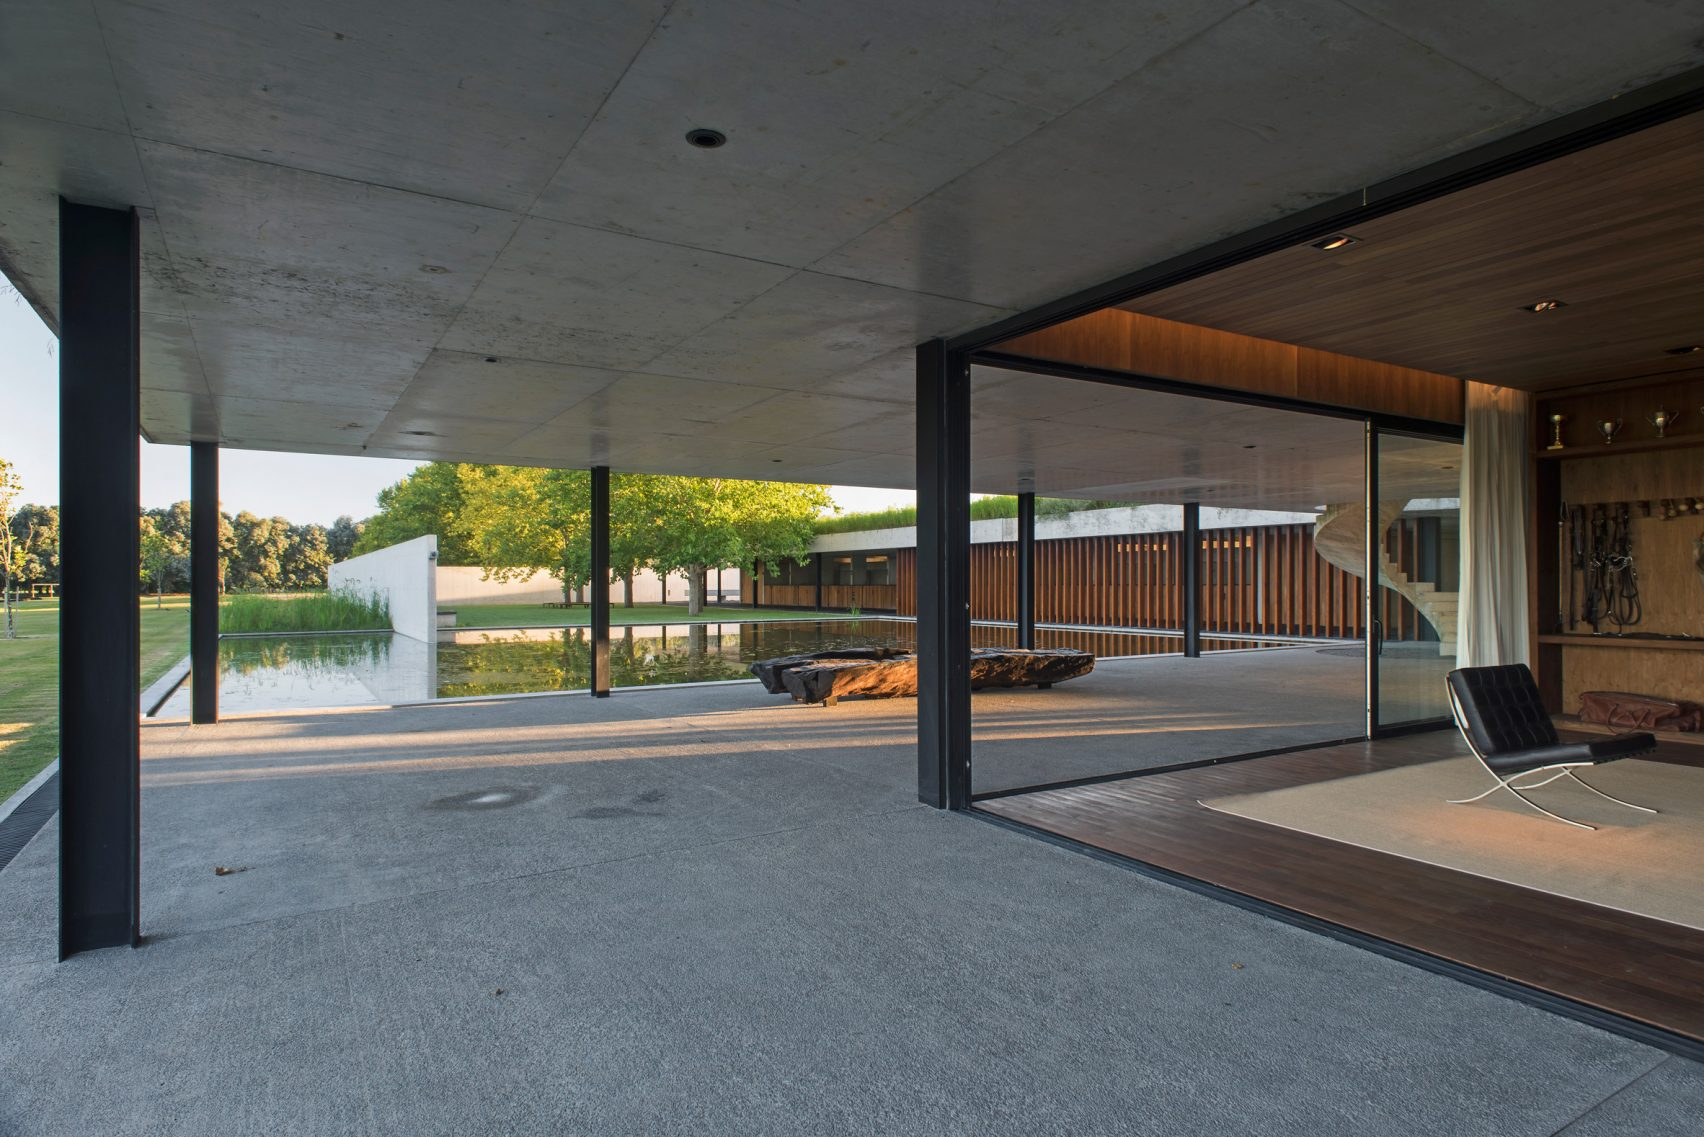 figueras-polo-stables-estudio-ramos-architecture-public-and-leisure_dezeen_2364_col_25-1704x1137.jpg